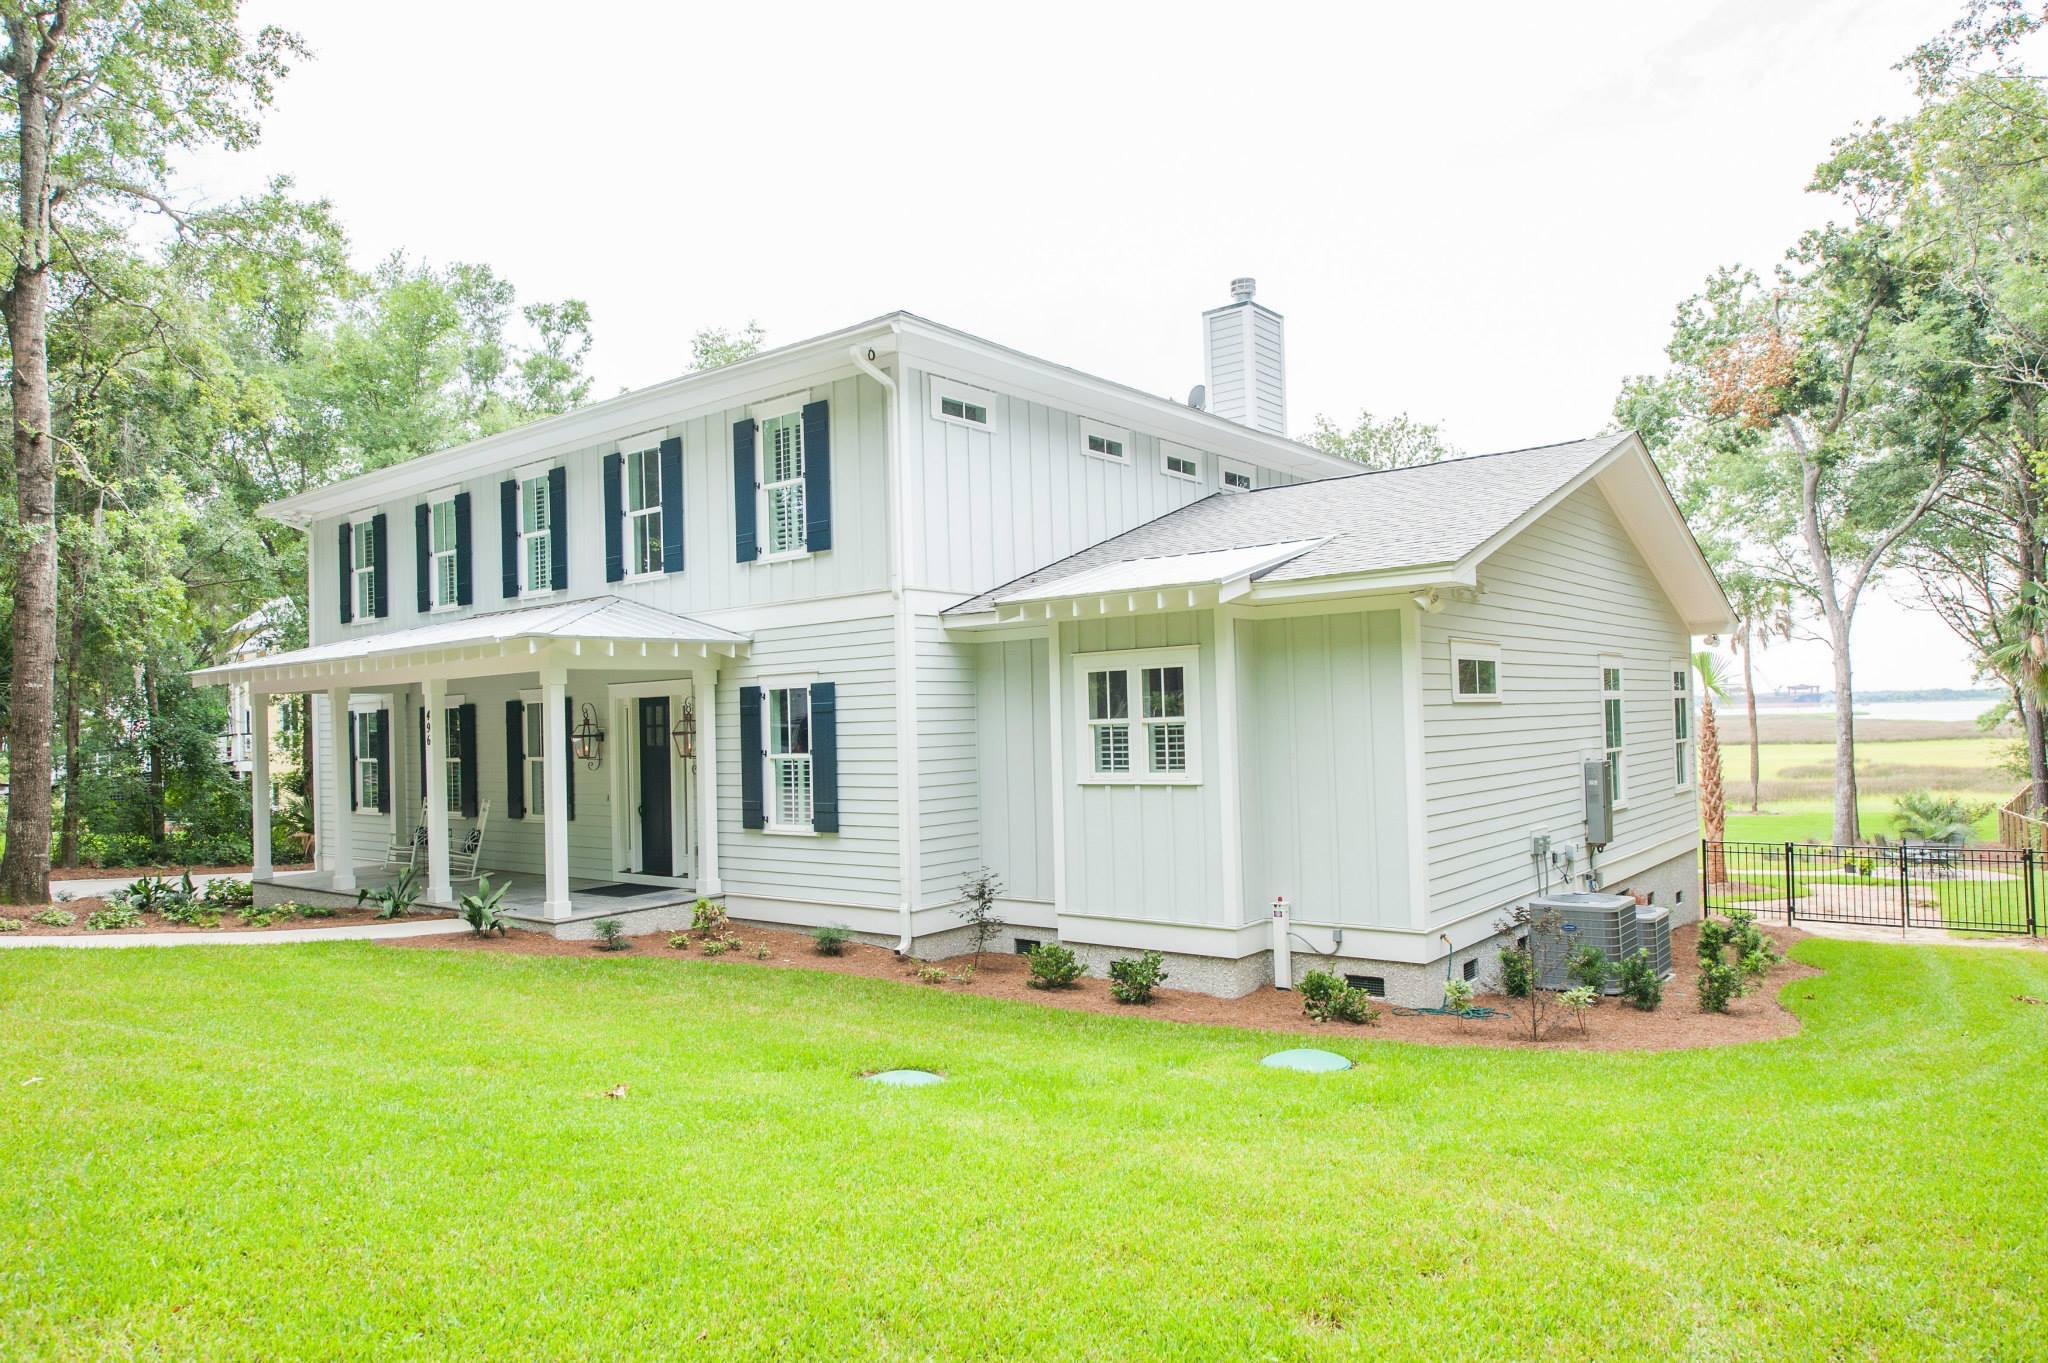 496 Yellow House Place Wando, SC 29492